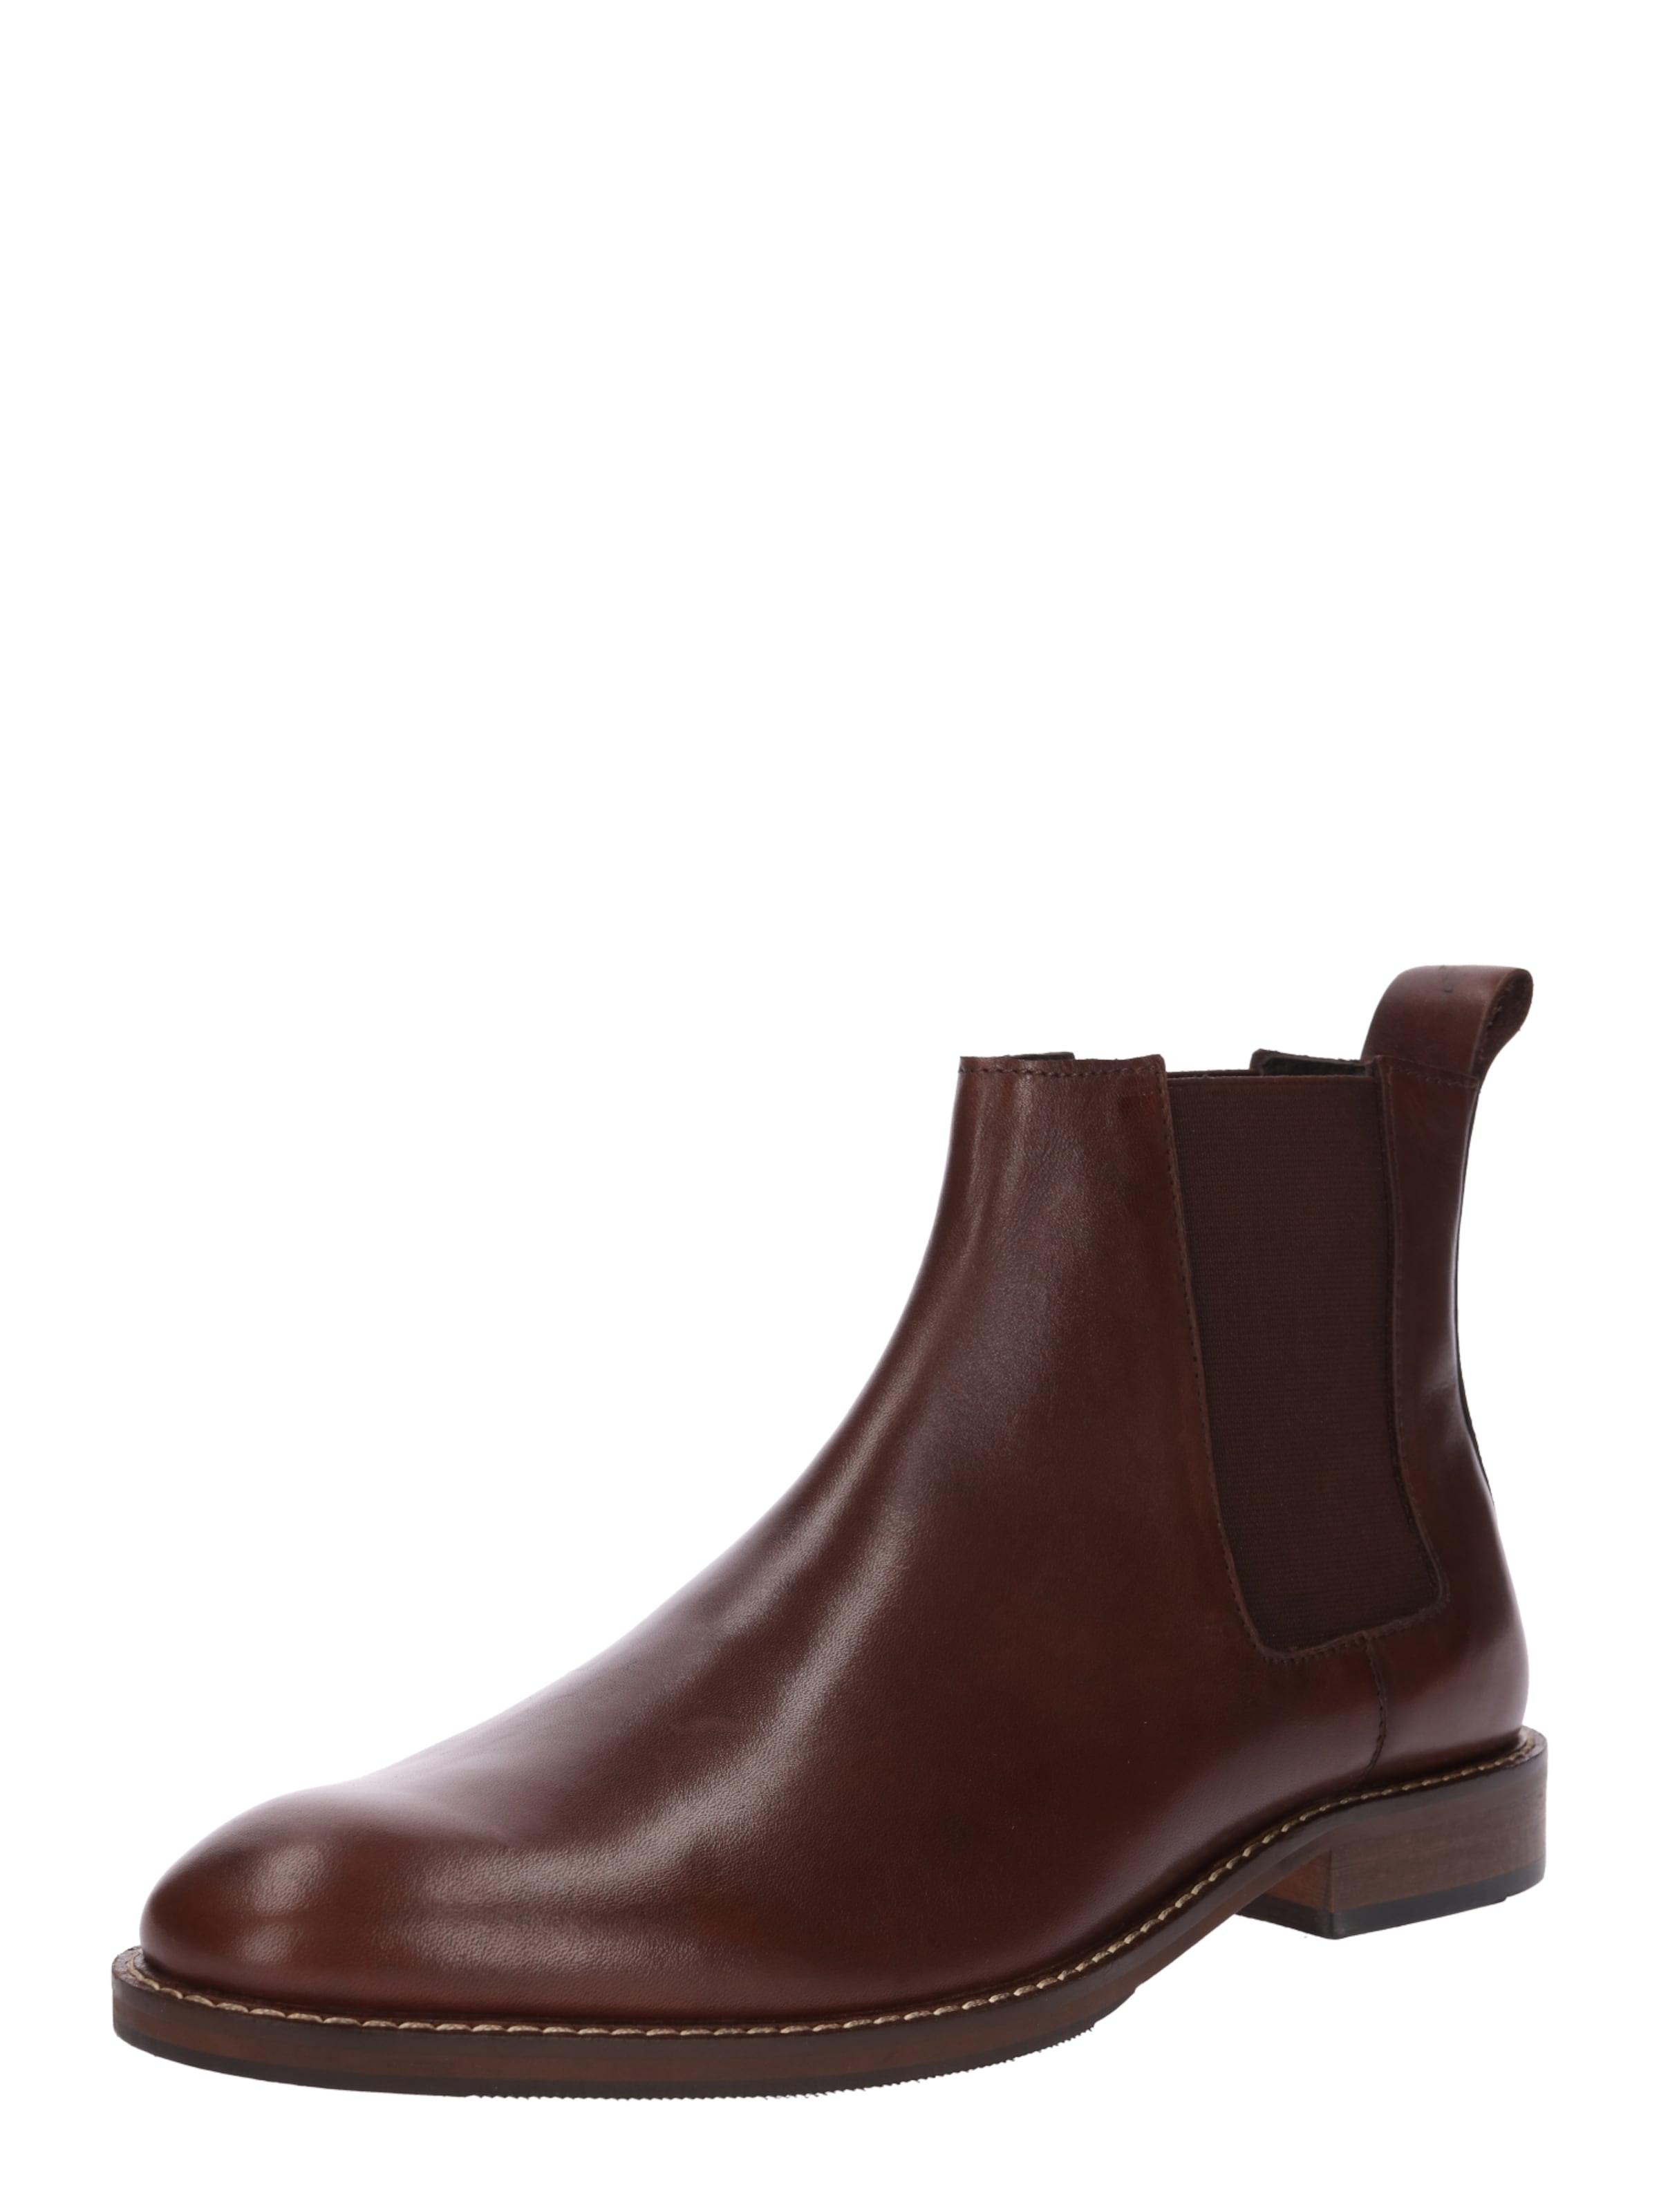 Zign Chelsea-Boots Chelsea-Boots Zign aus Glattleder Günstige und langlebige Schuhe 385e31